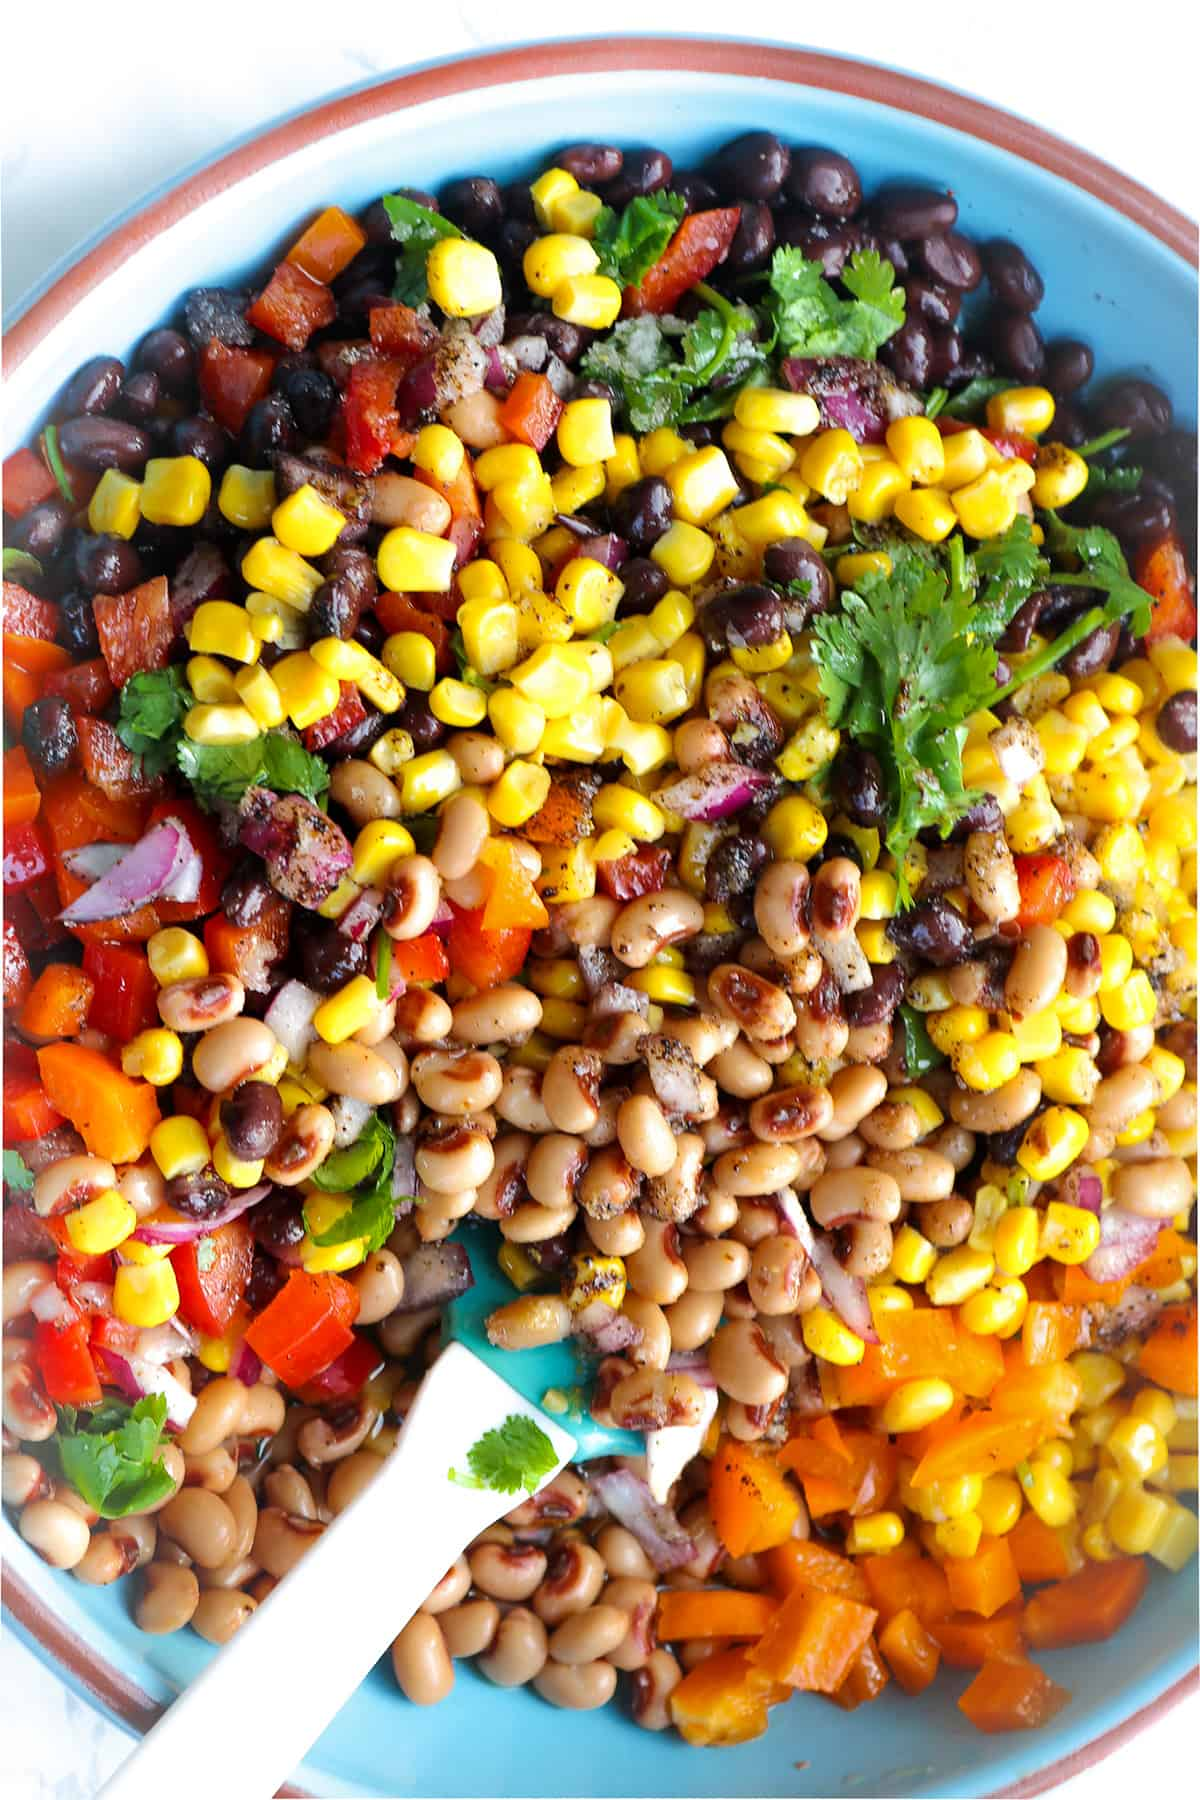 Cowboy Caviar ingredients in large bowl